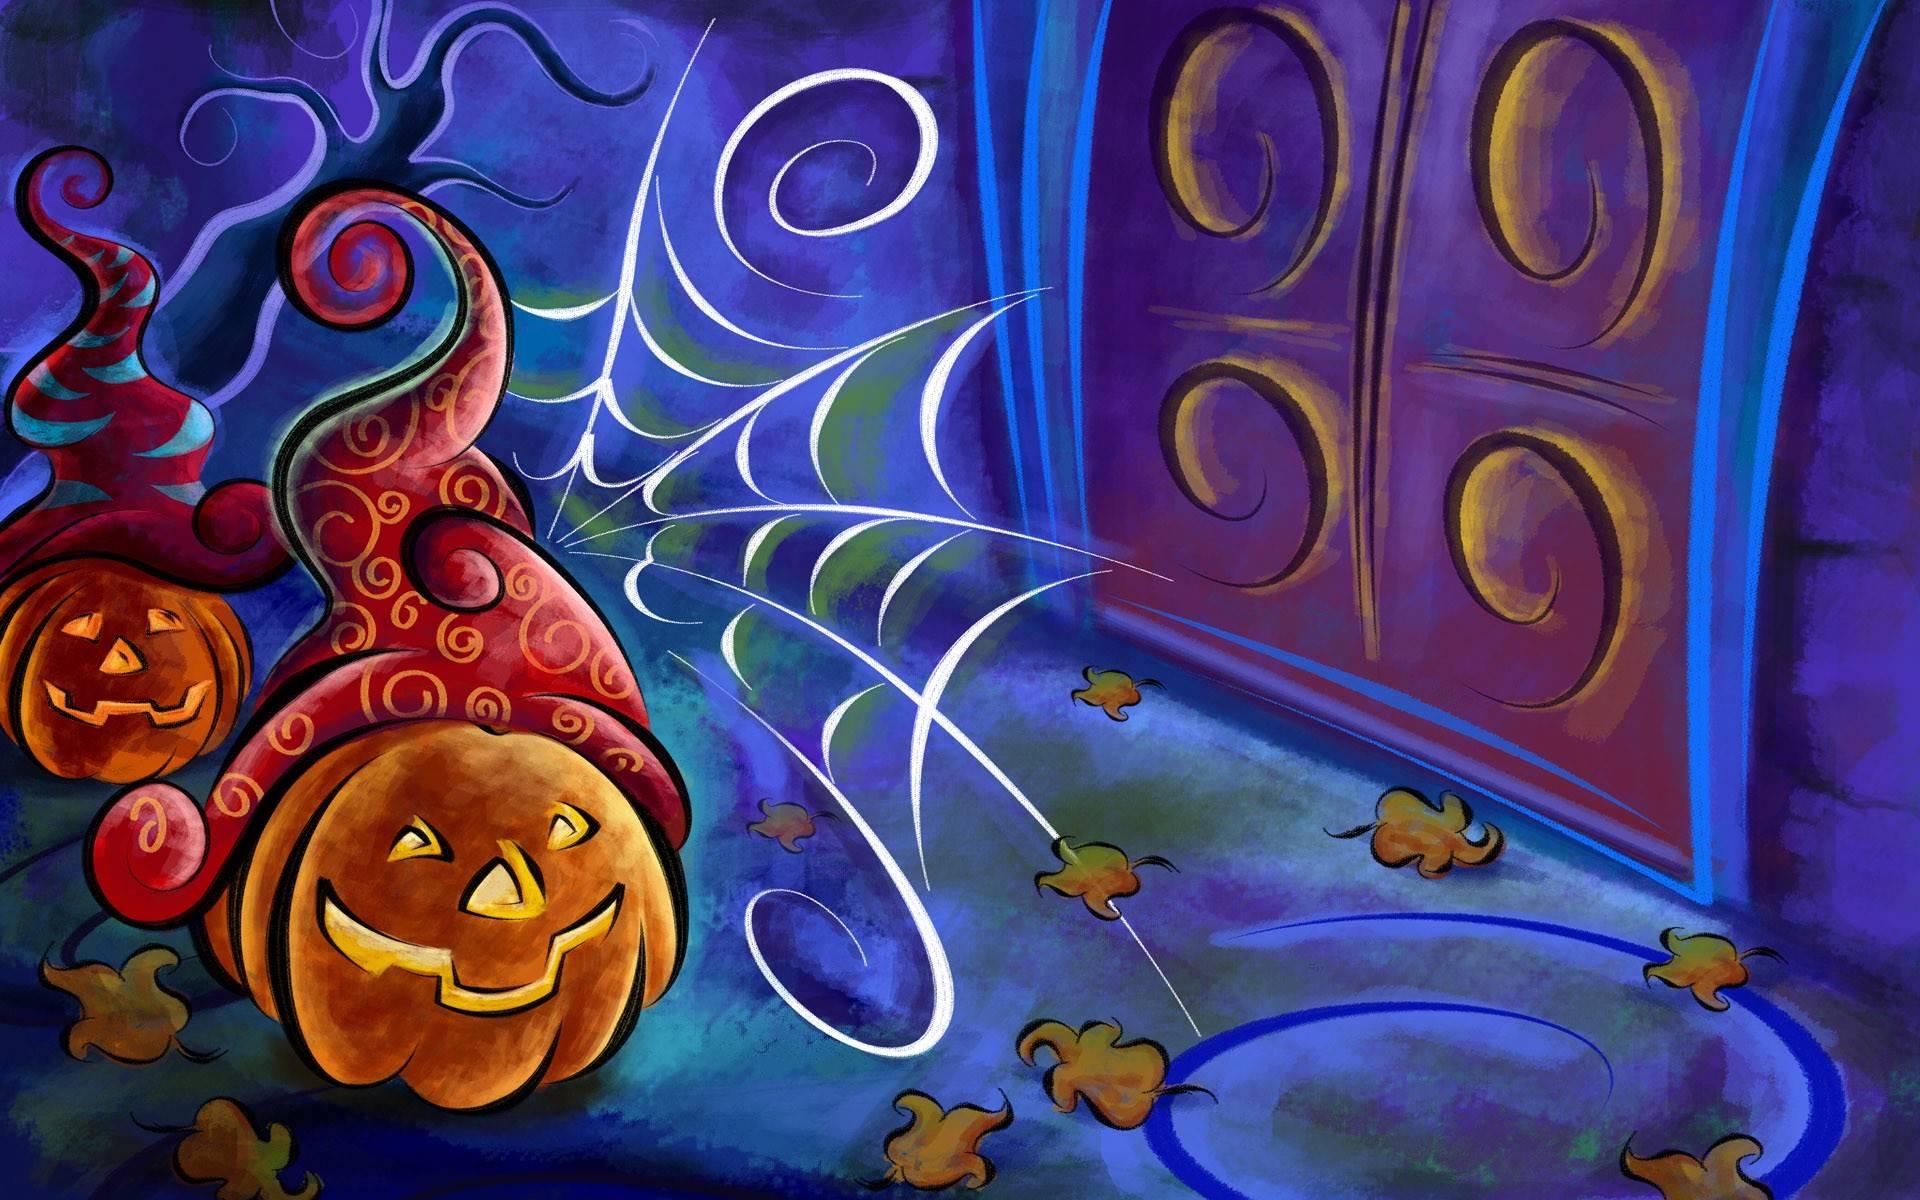 Halloween Wallpapers Screensavers - Wallpaper Cave